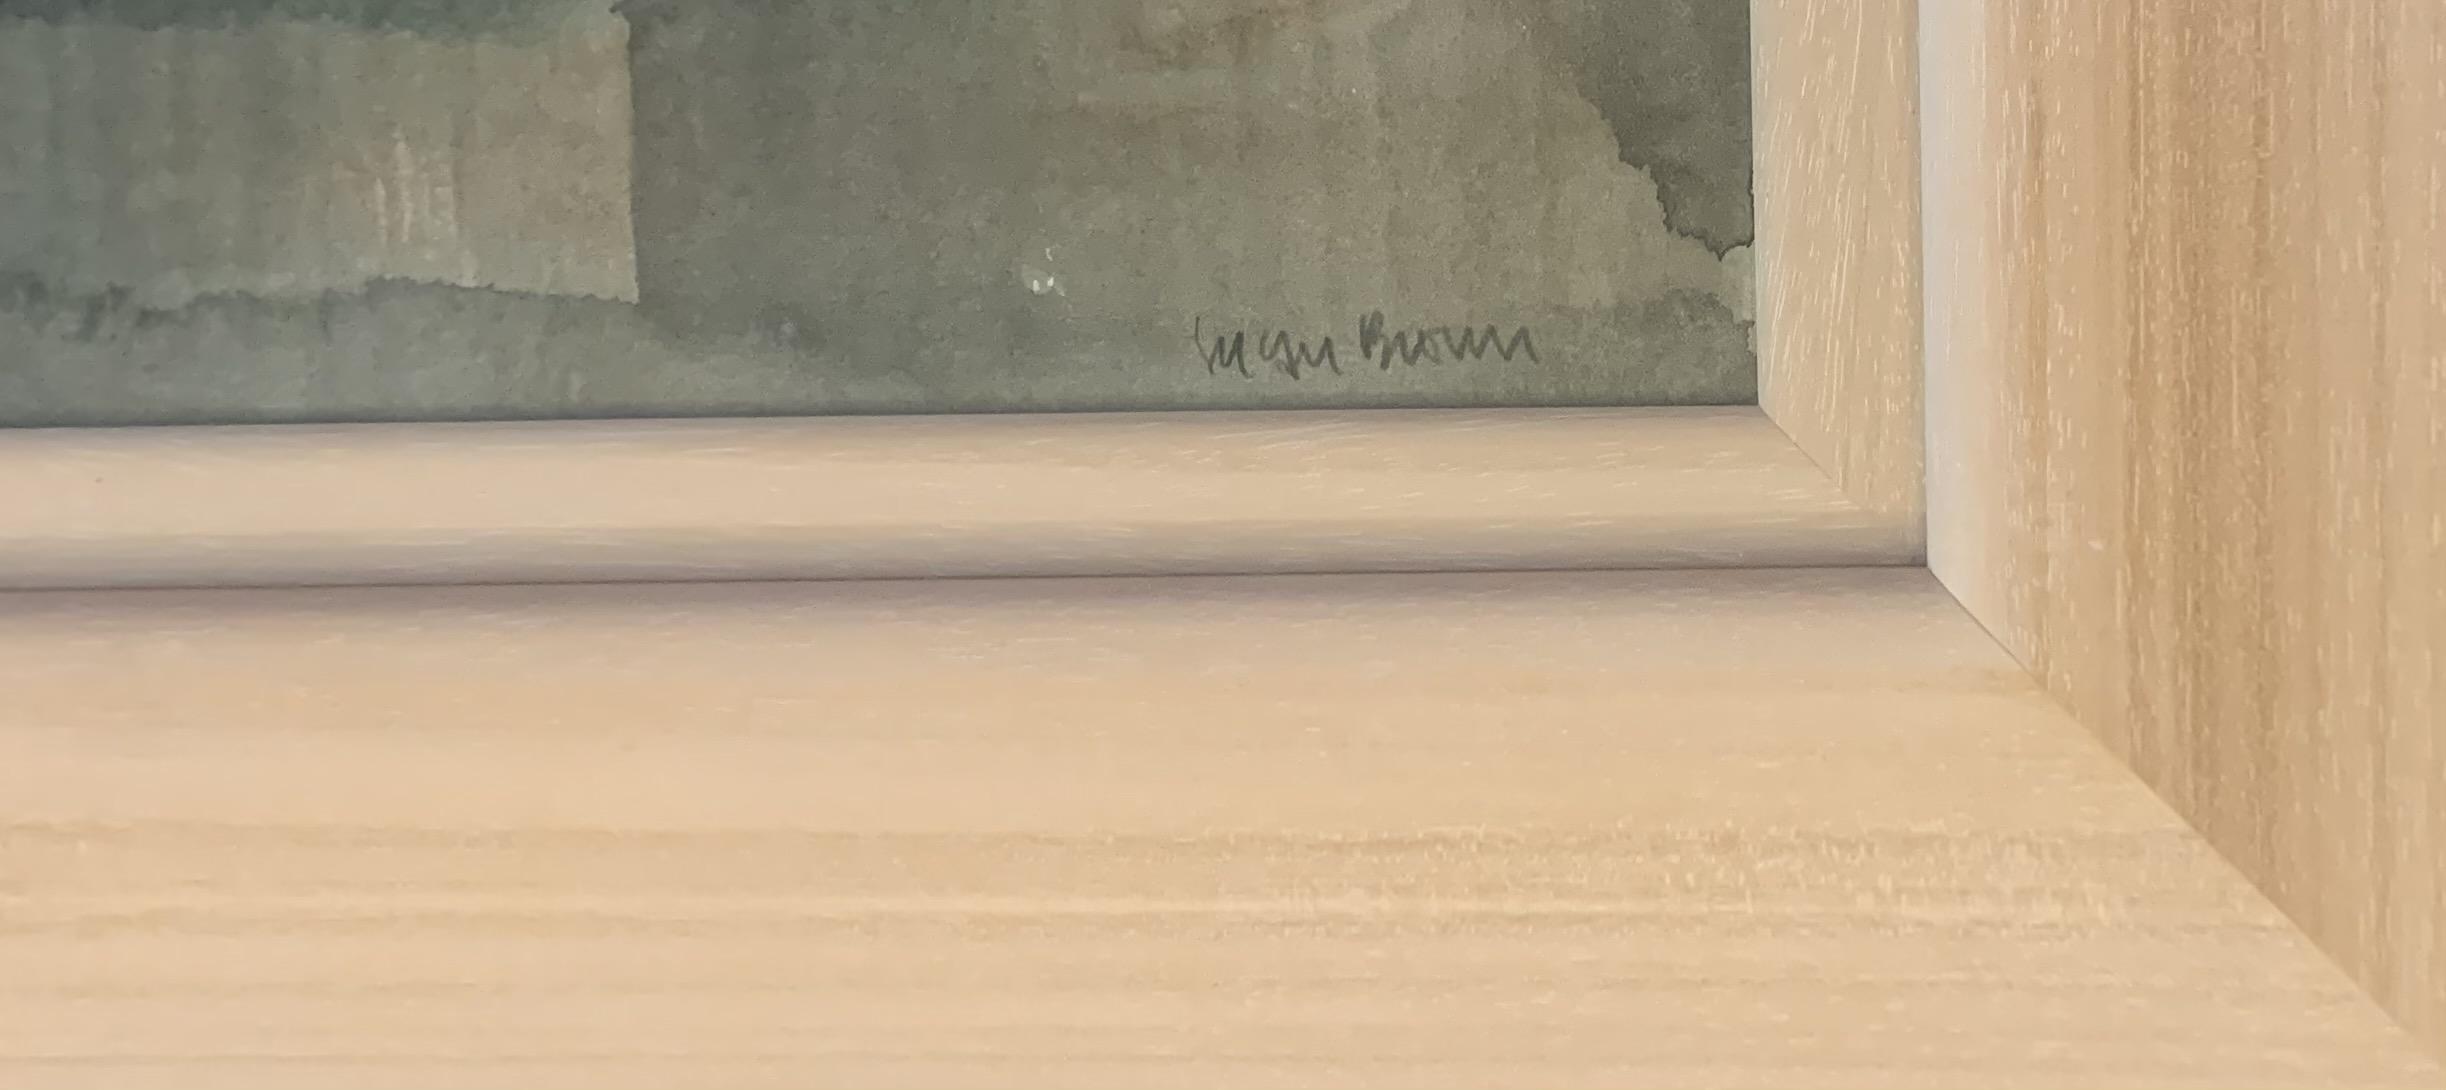 "Susan Brown watercolour 'Ponte Vecchio' , image 20"" x 14"", frame 29"" x 23.5"" good condition - Image 2 of 4"